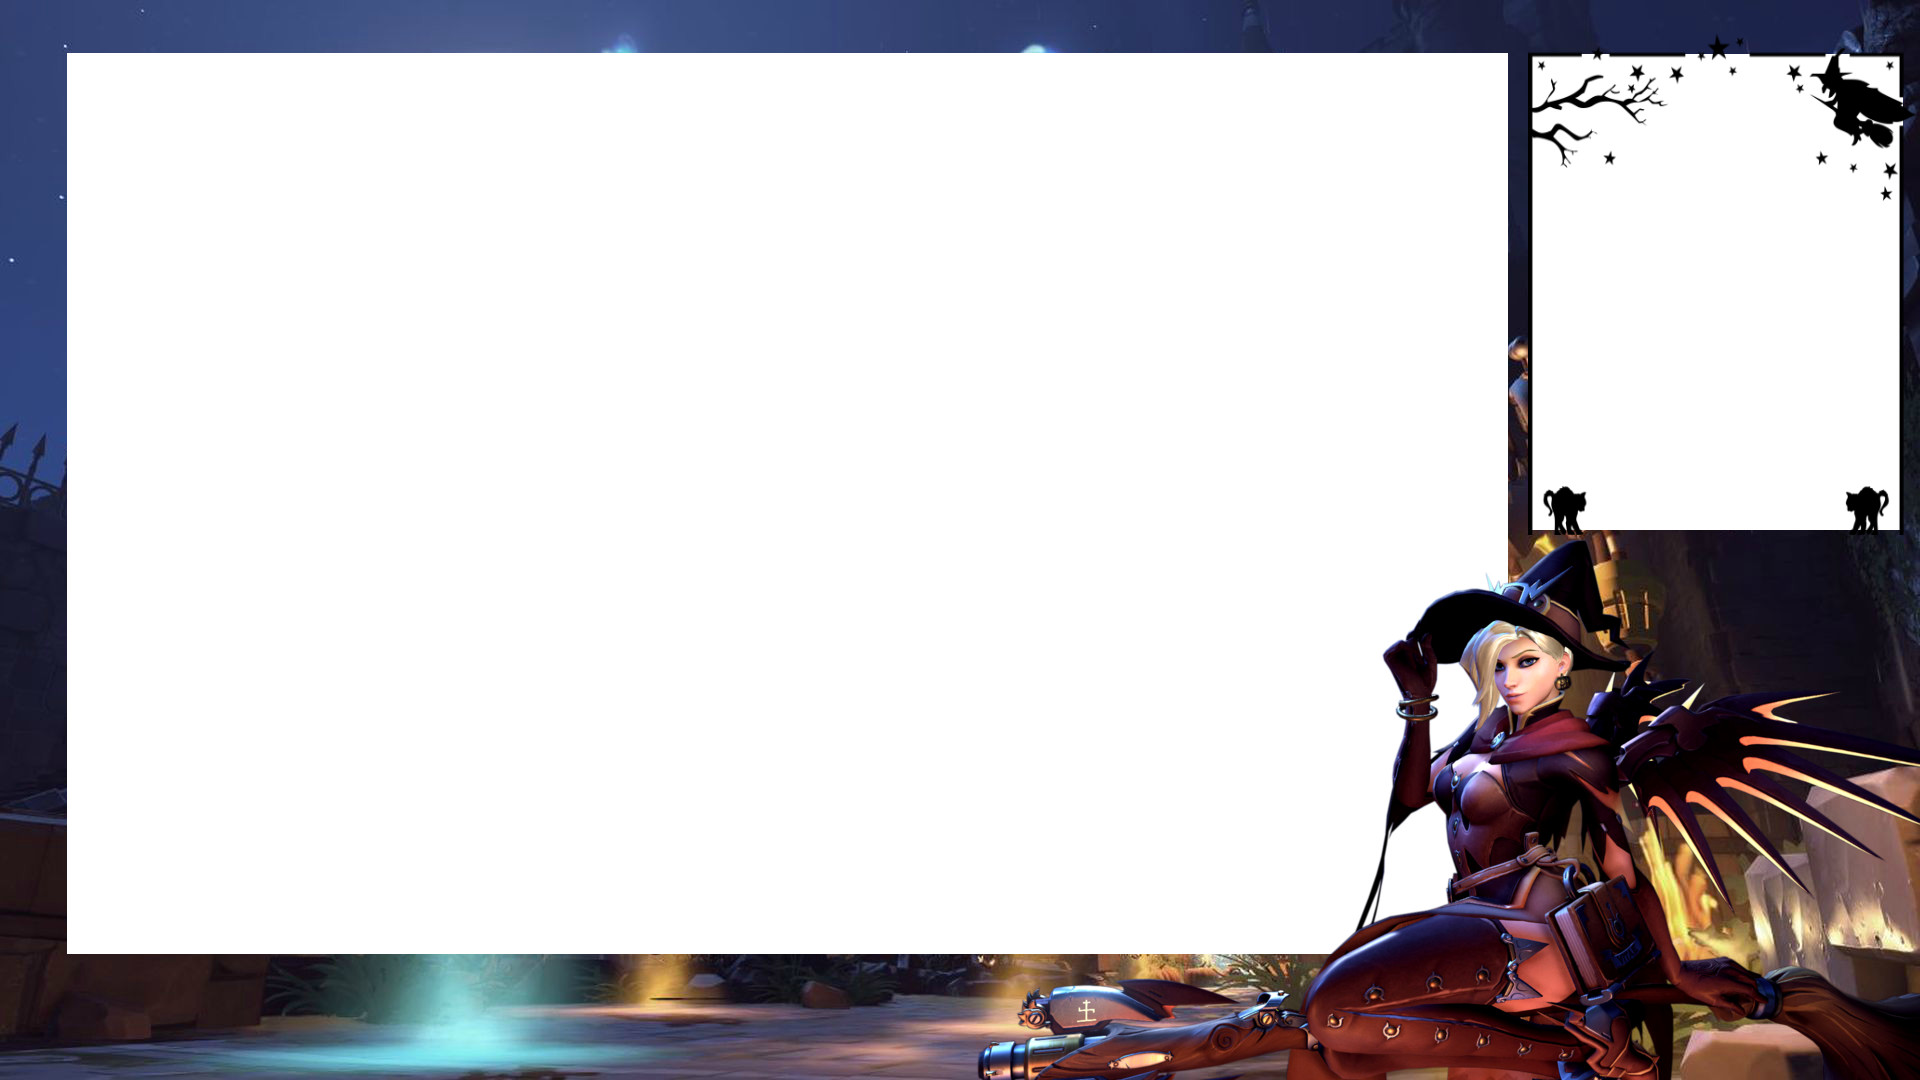 discord overlay in overwatch